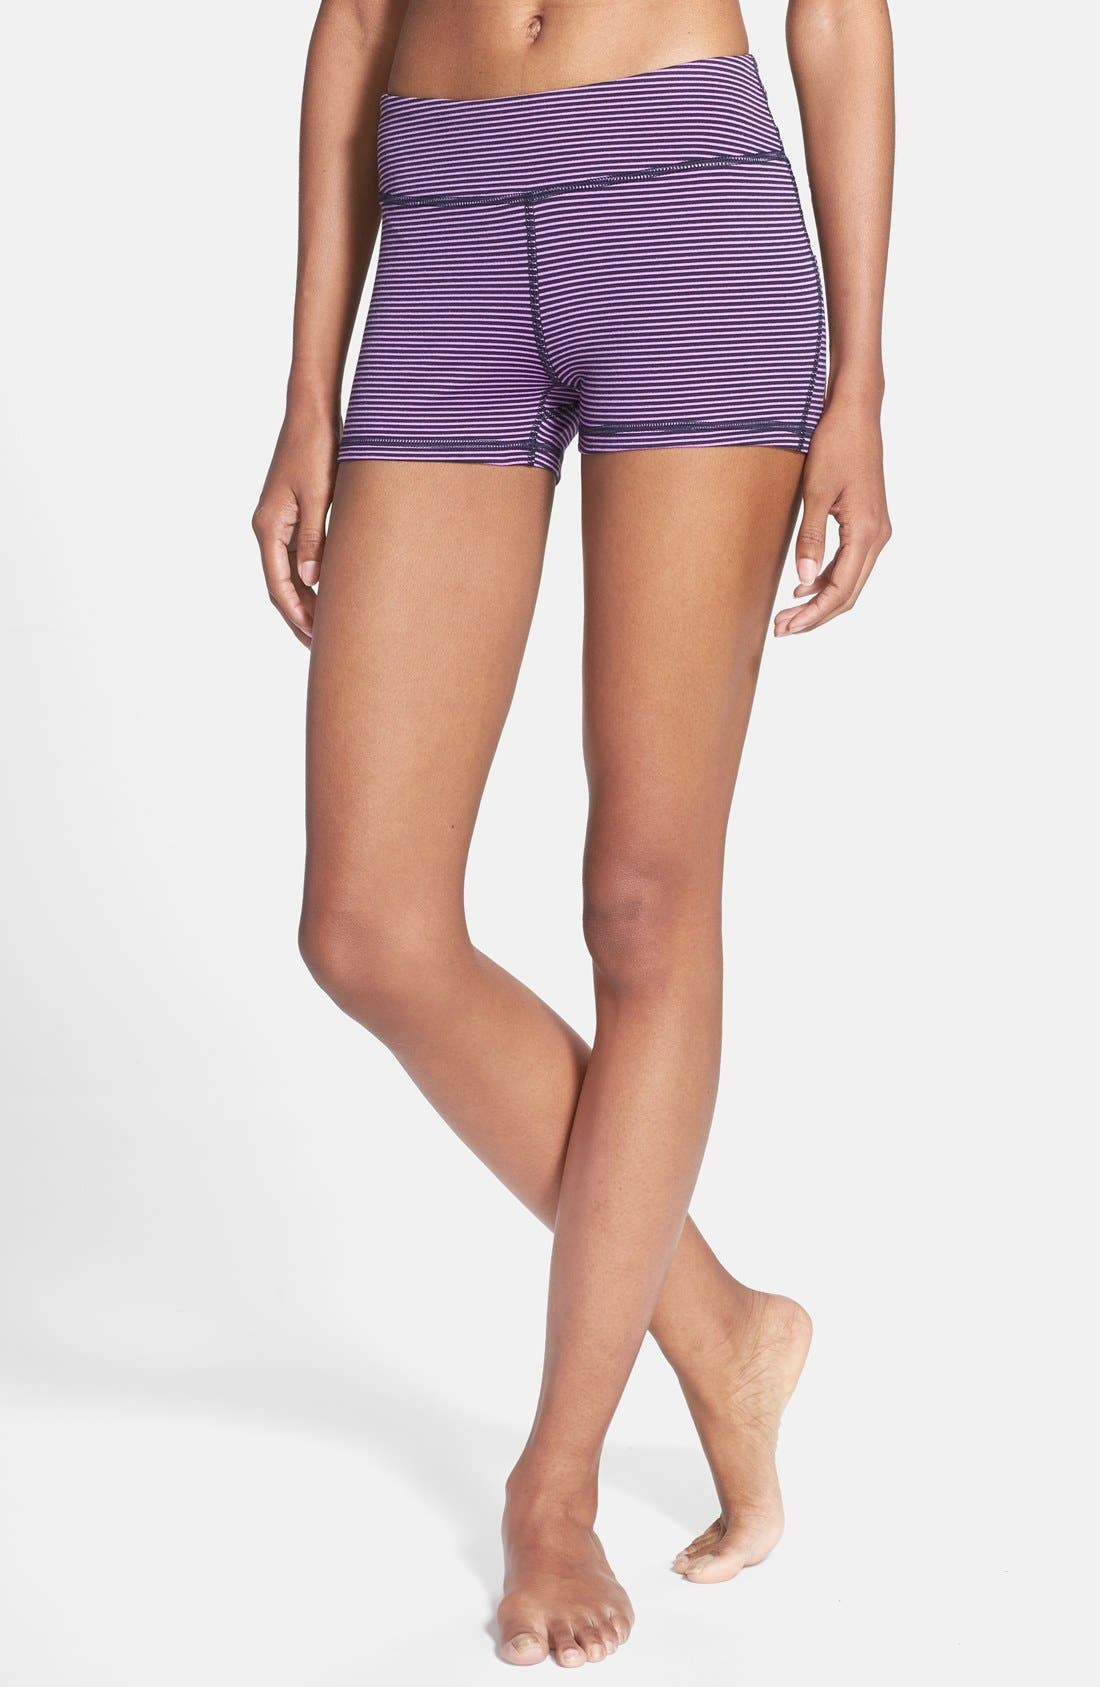 Alternate Image 1 Selected - Zella 'Haute' Compression Shorts